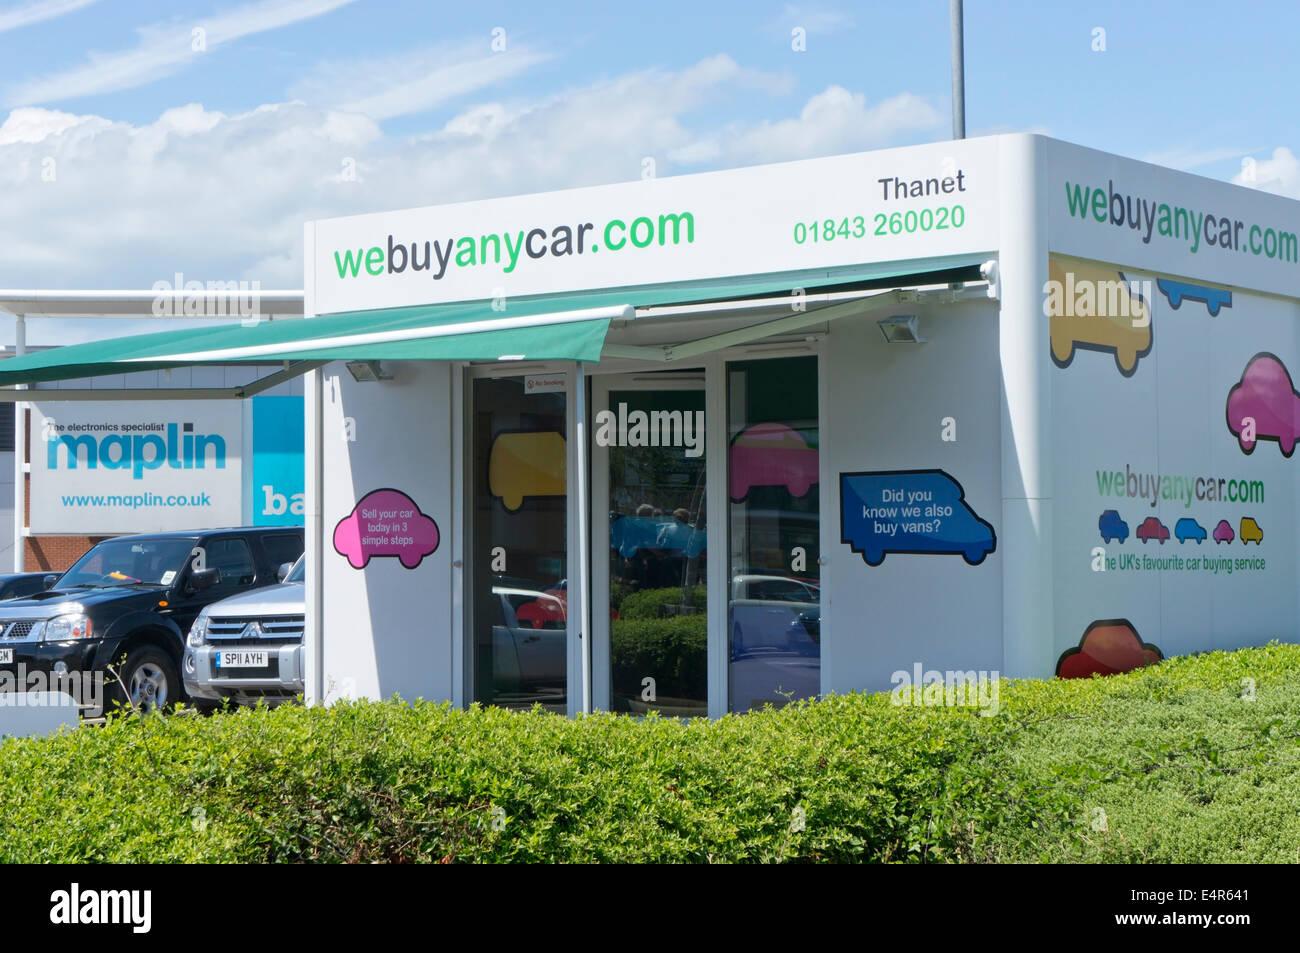 We Buy Any Car Com Stock Photos & We Buy Any Car Com Stock Images ...